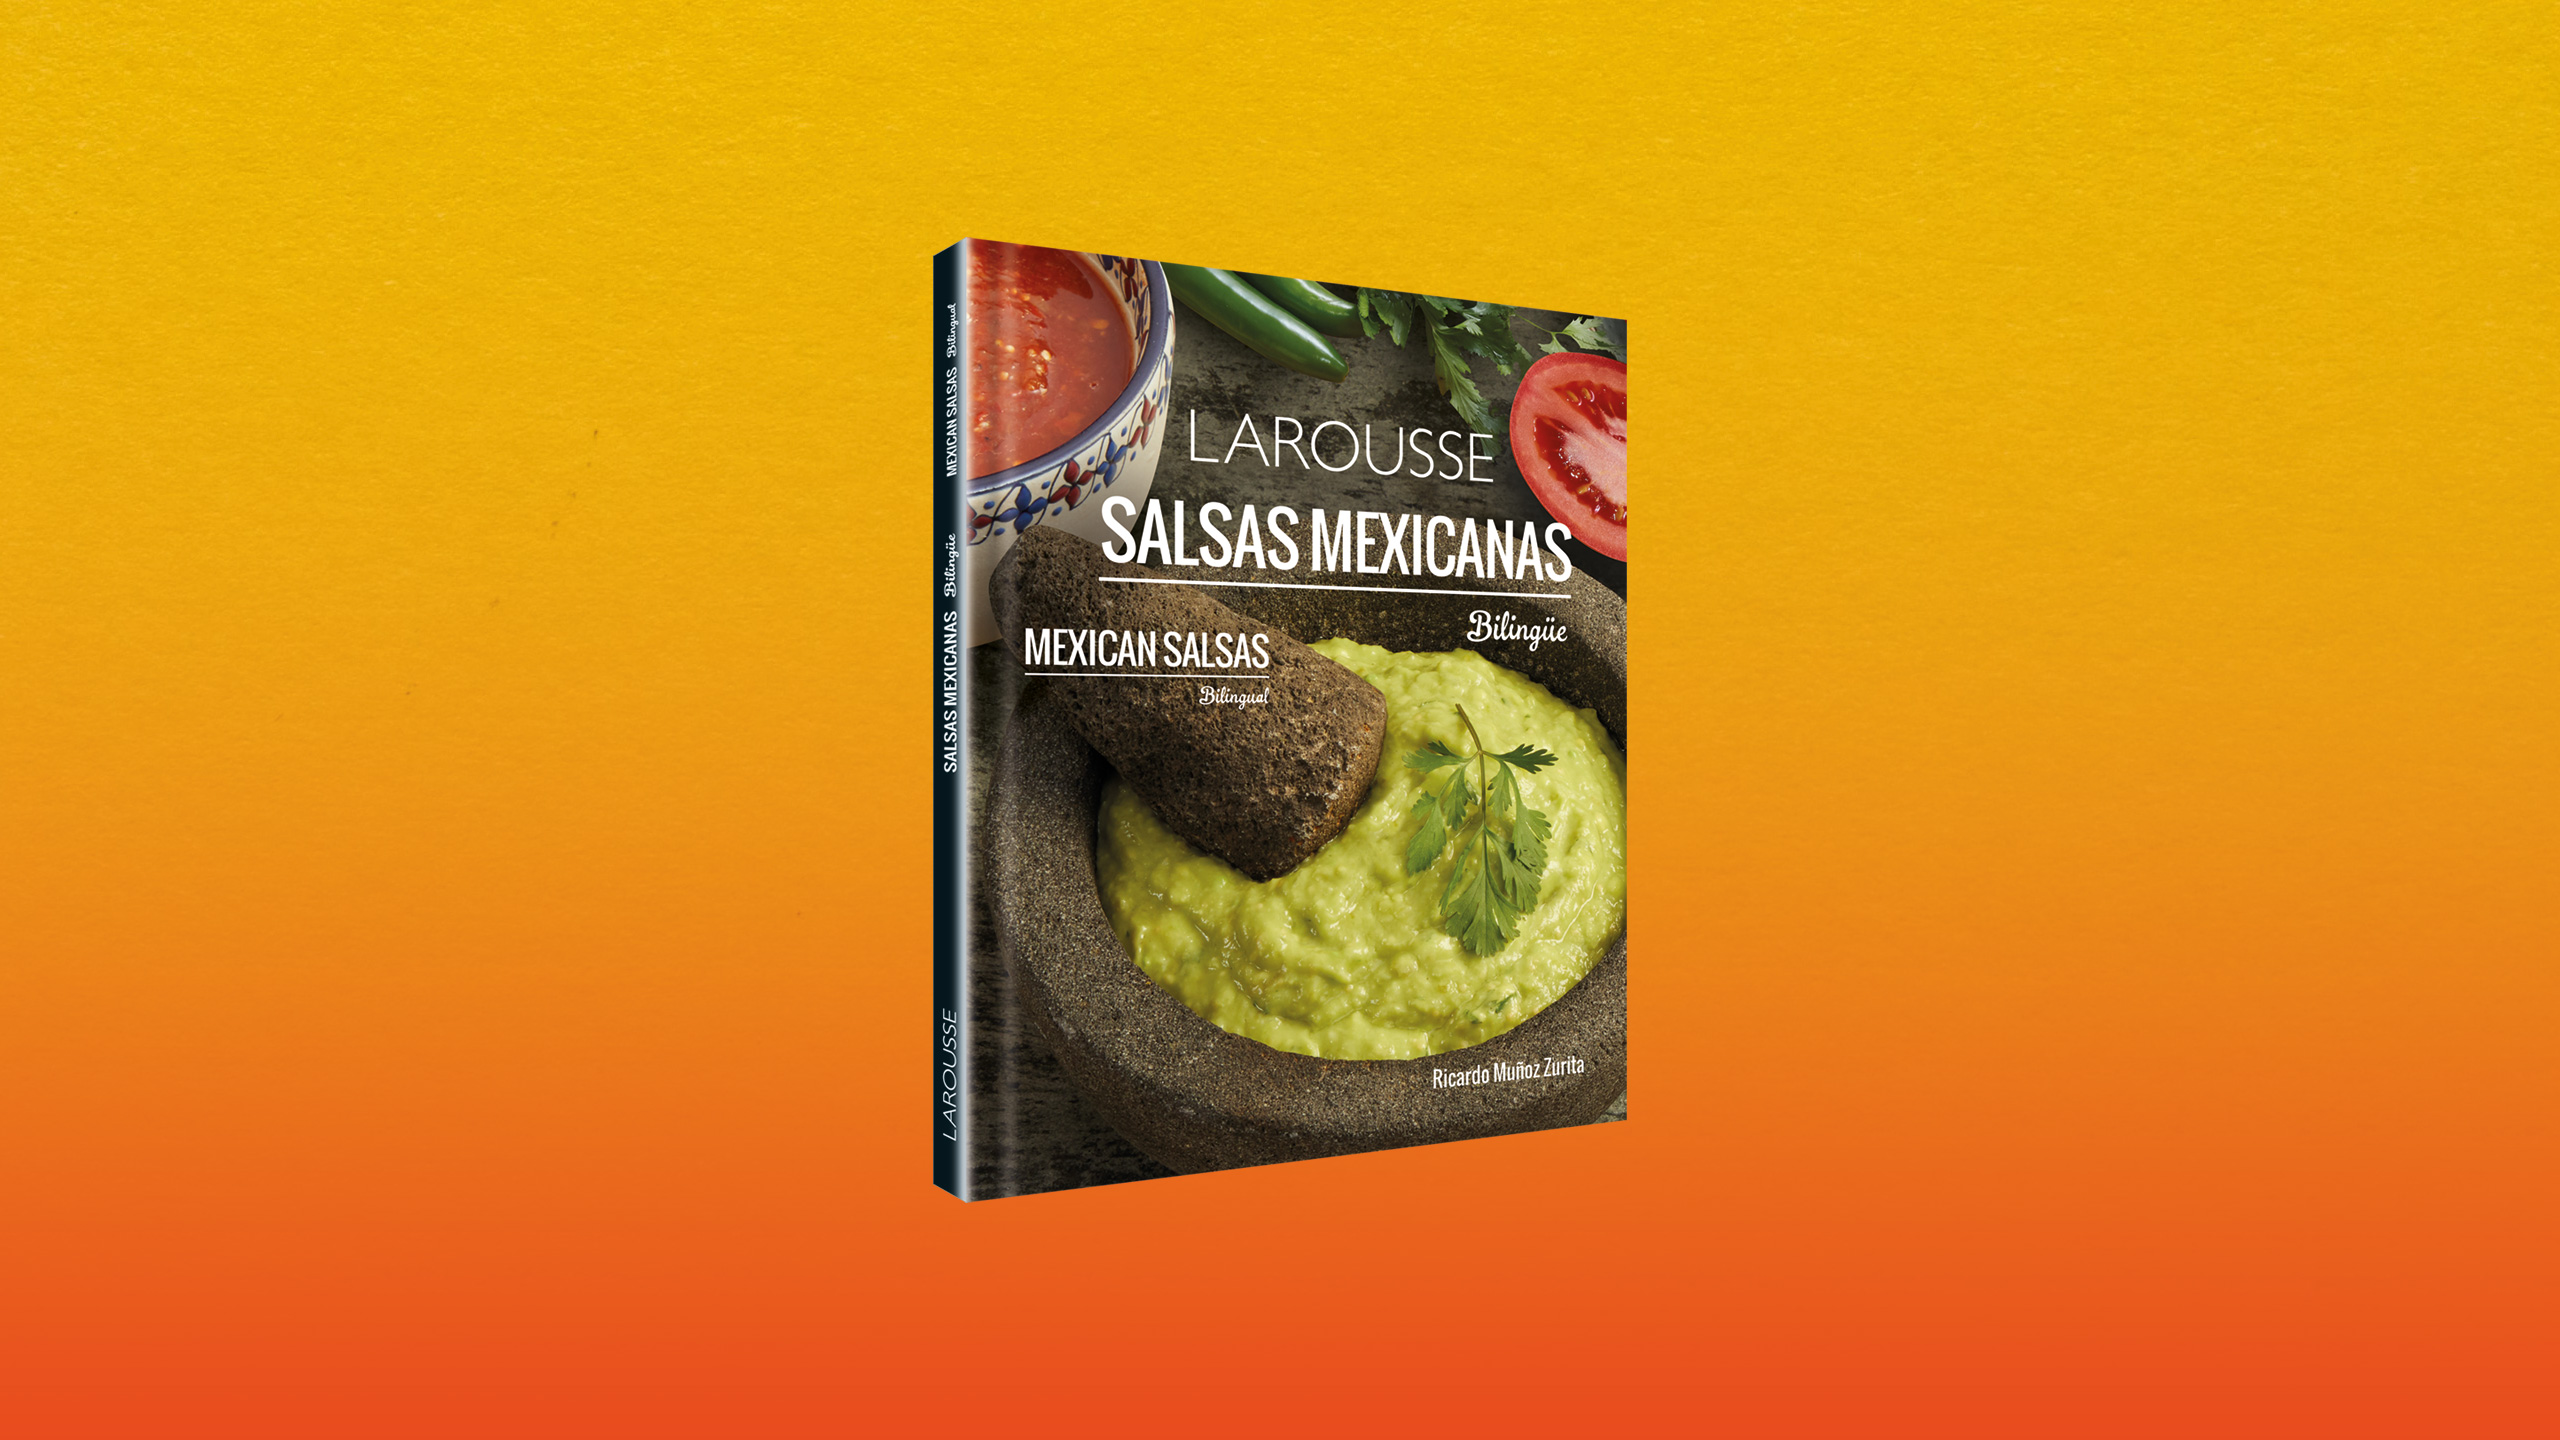 libro salsas mexicanas, ricardo munoz zurita